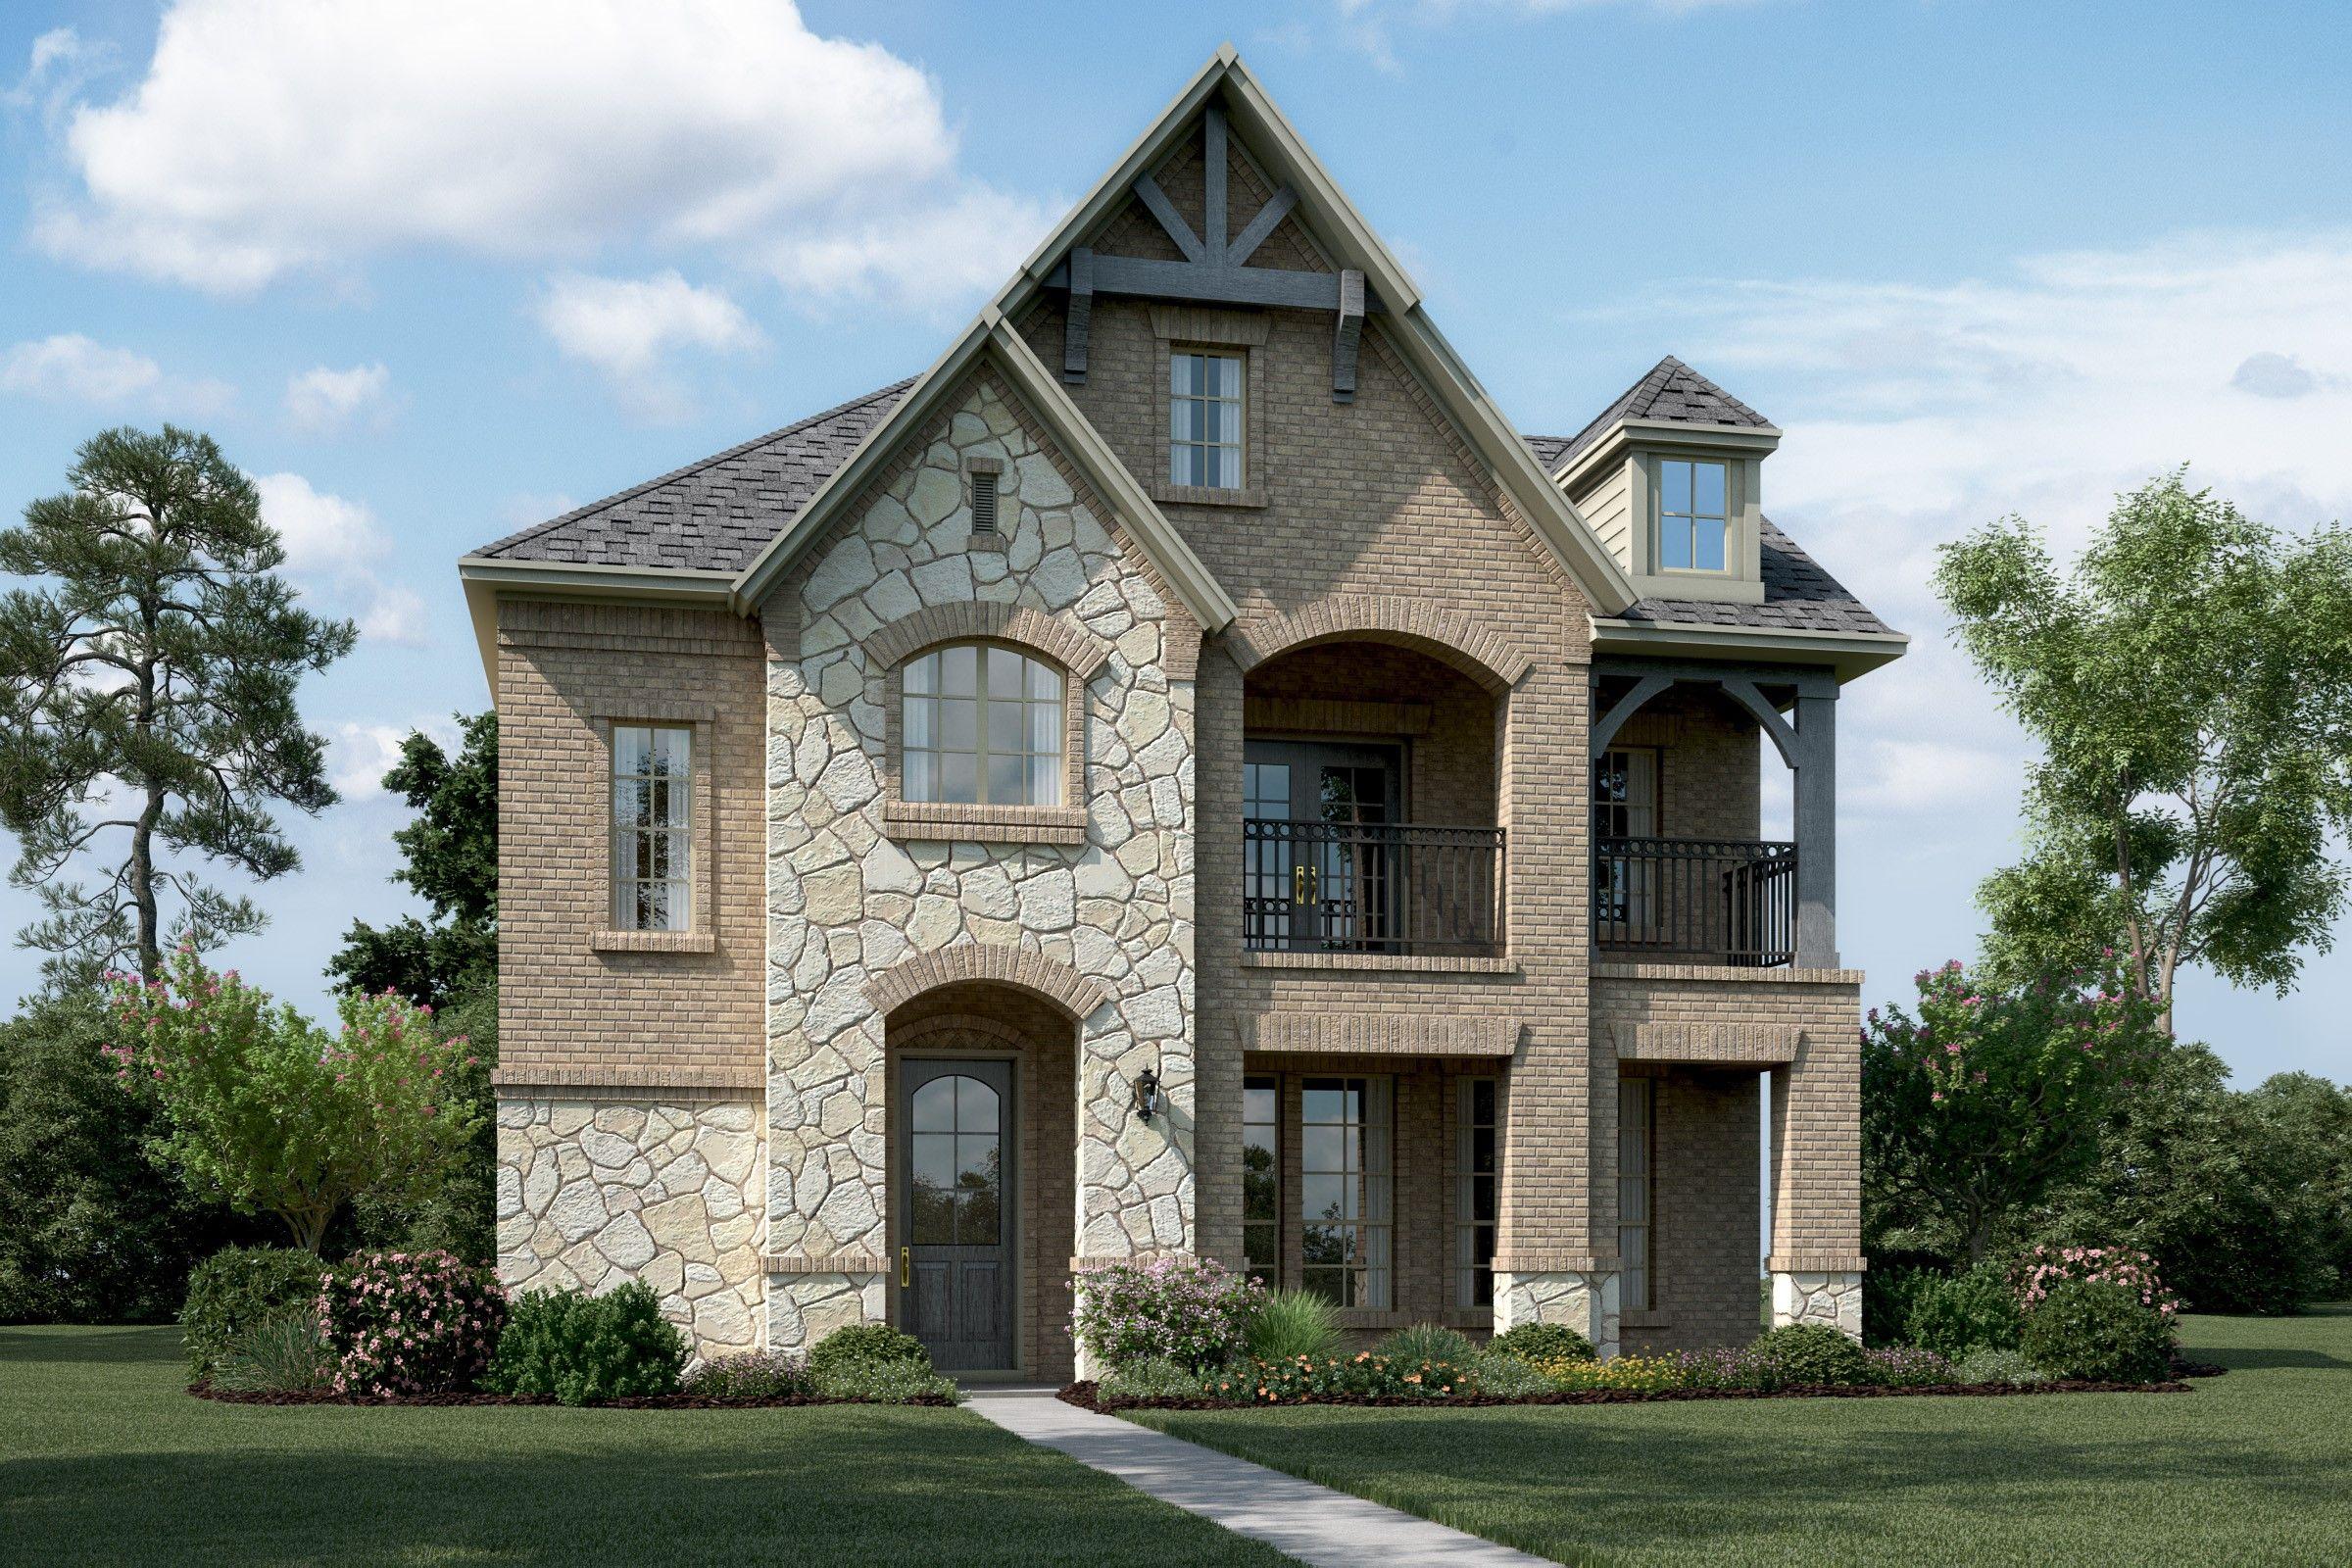 Single Family for Sale at Palisades - Castlebury 2488 Castle Ridge Drive Richardson, Texas 75080 United States